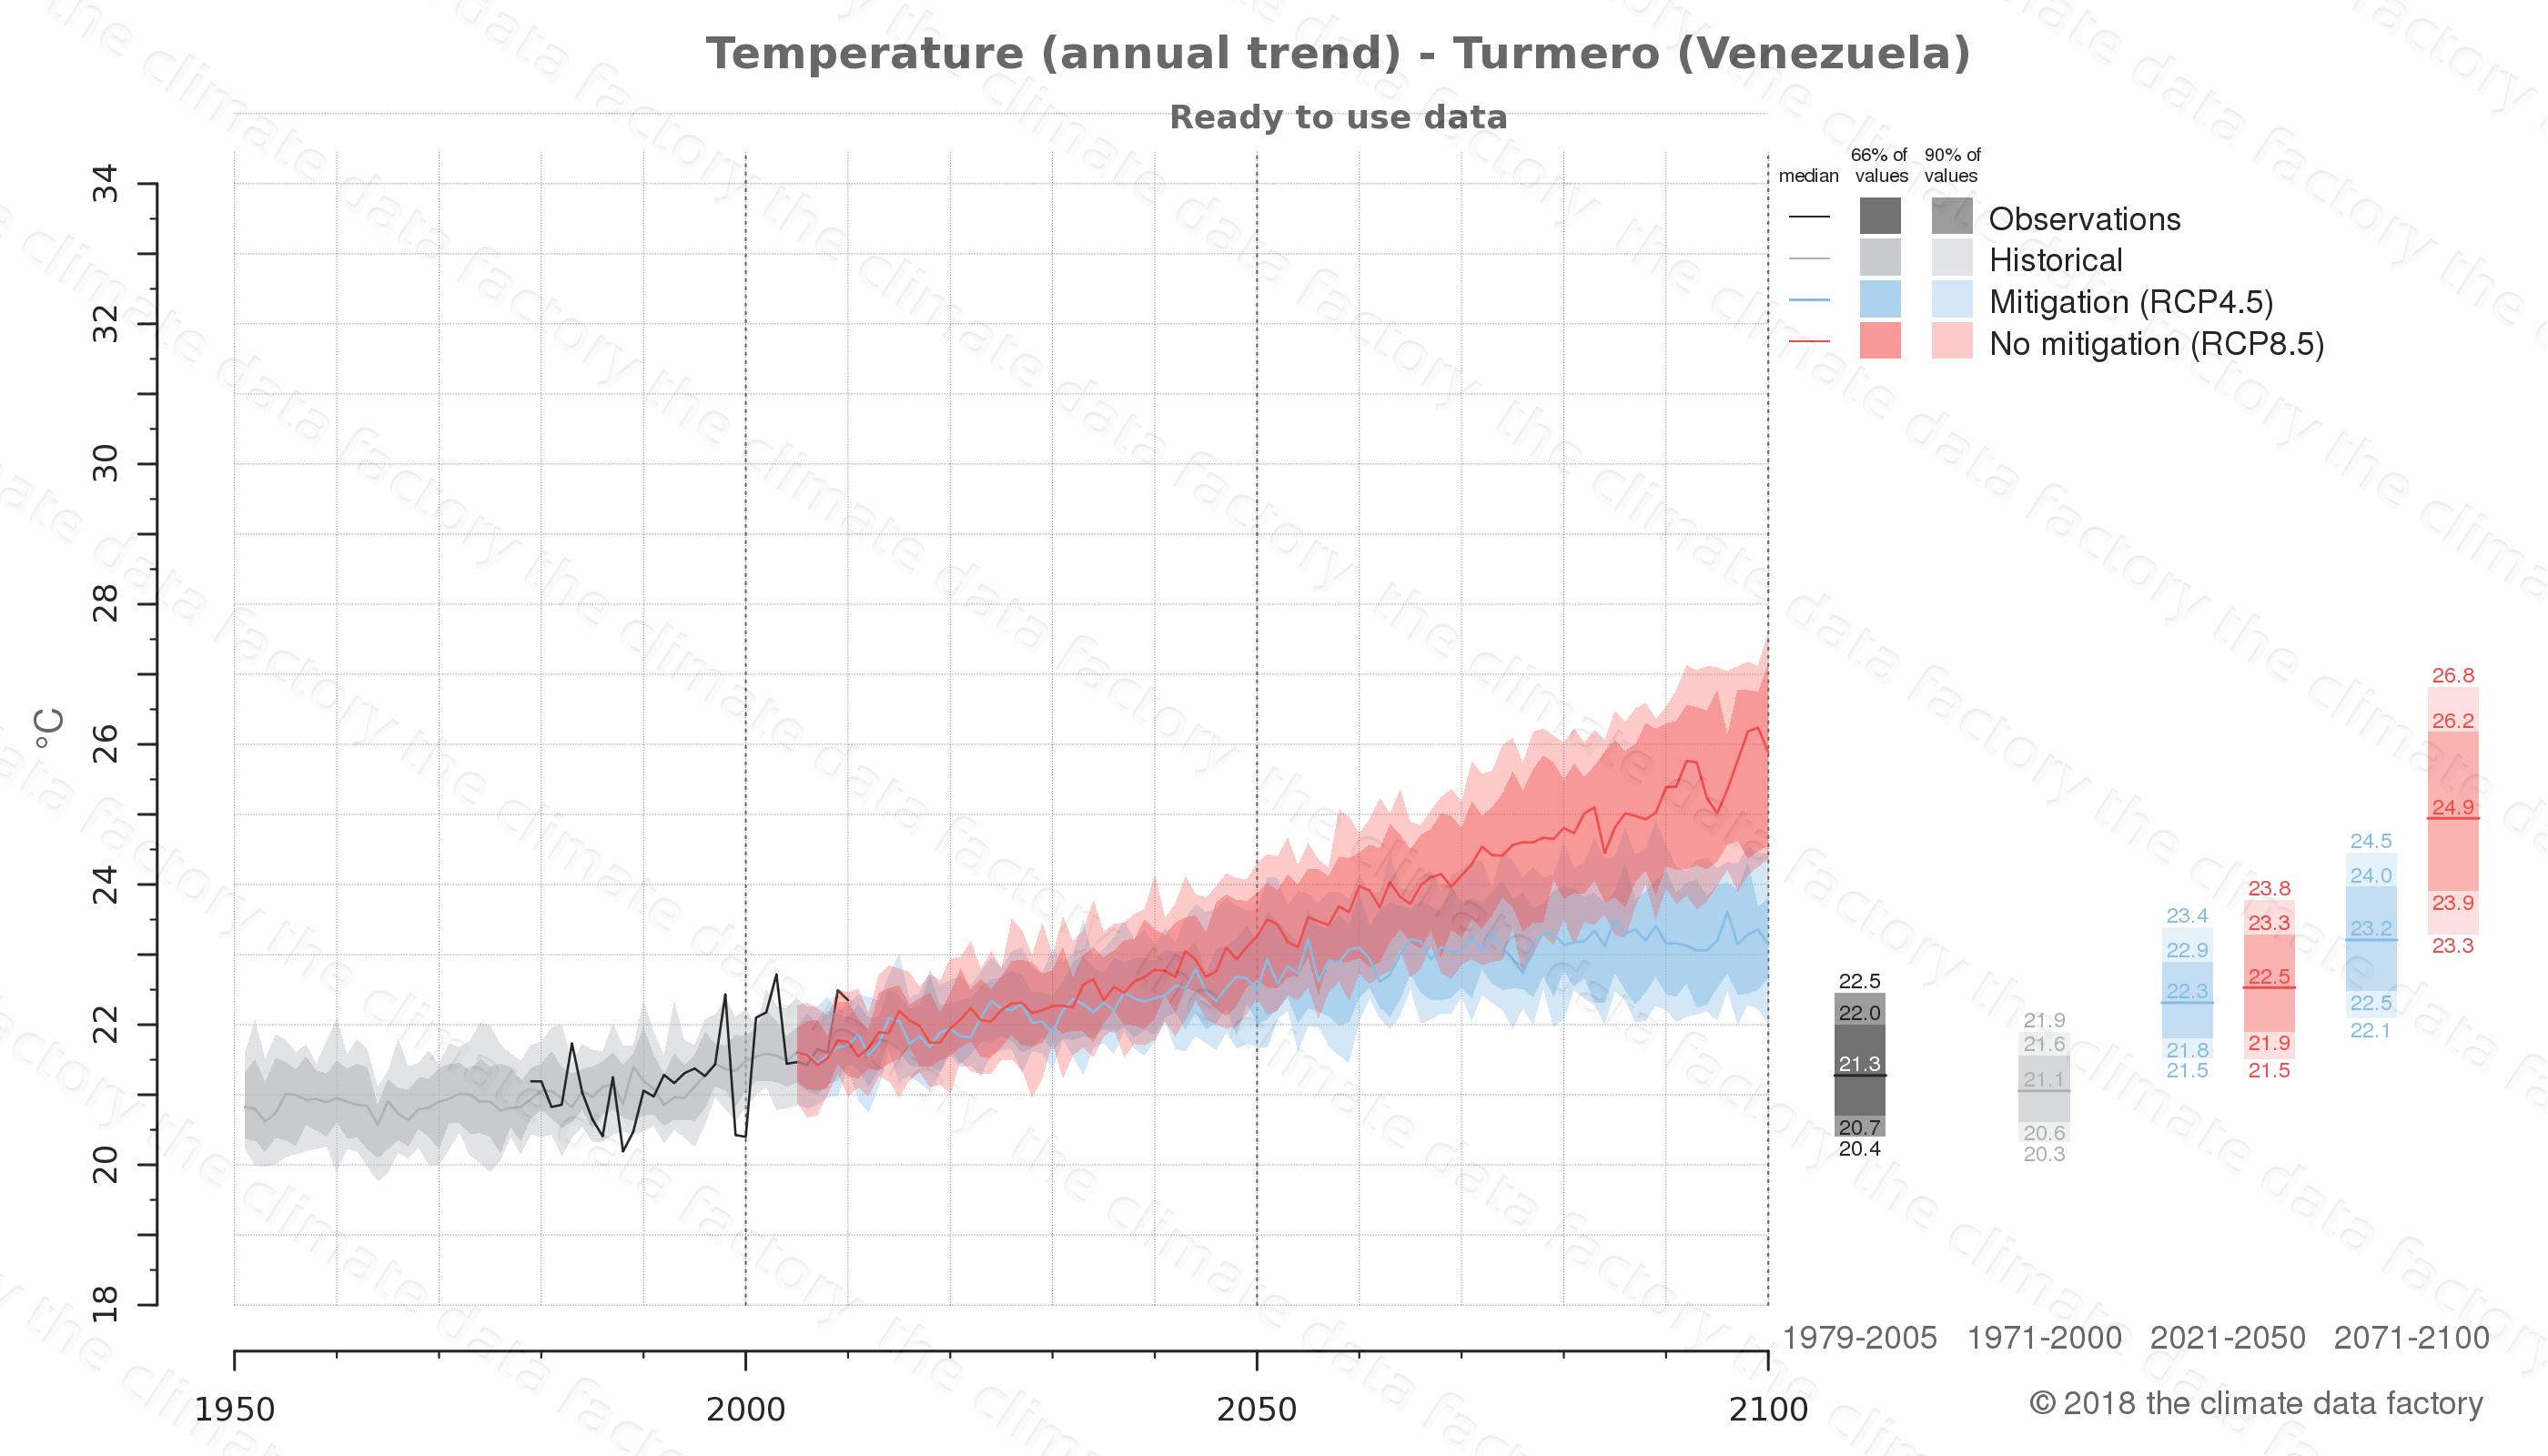 climate change data policy adaptation climate graph city data temperature turmero venezuela